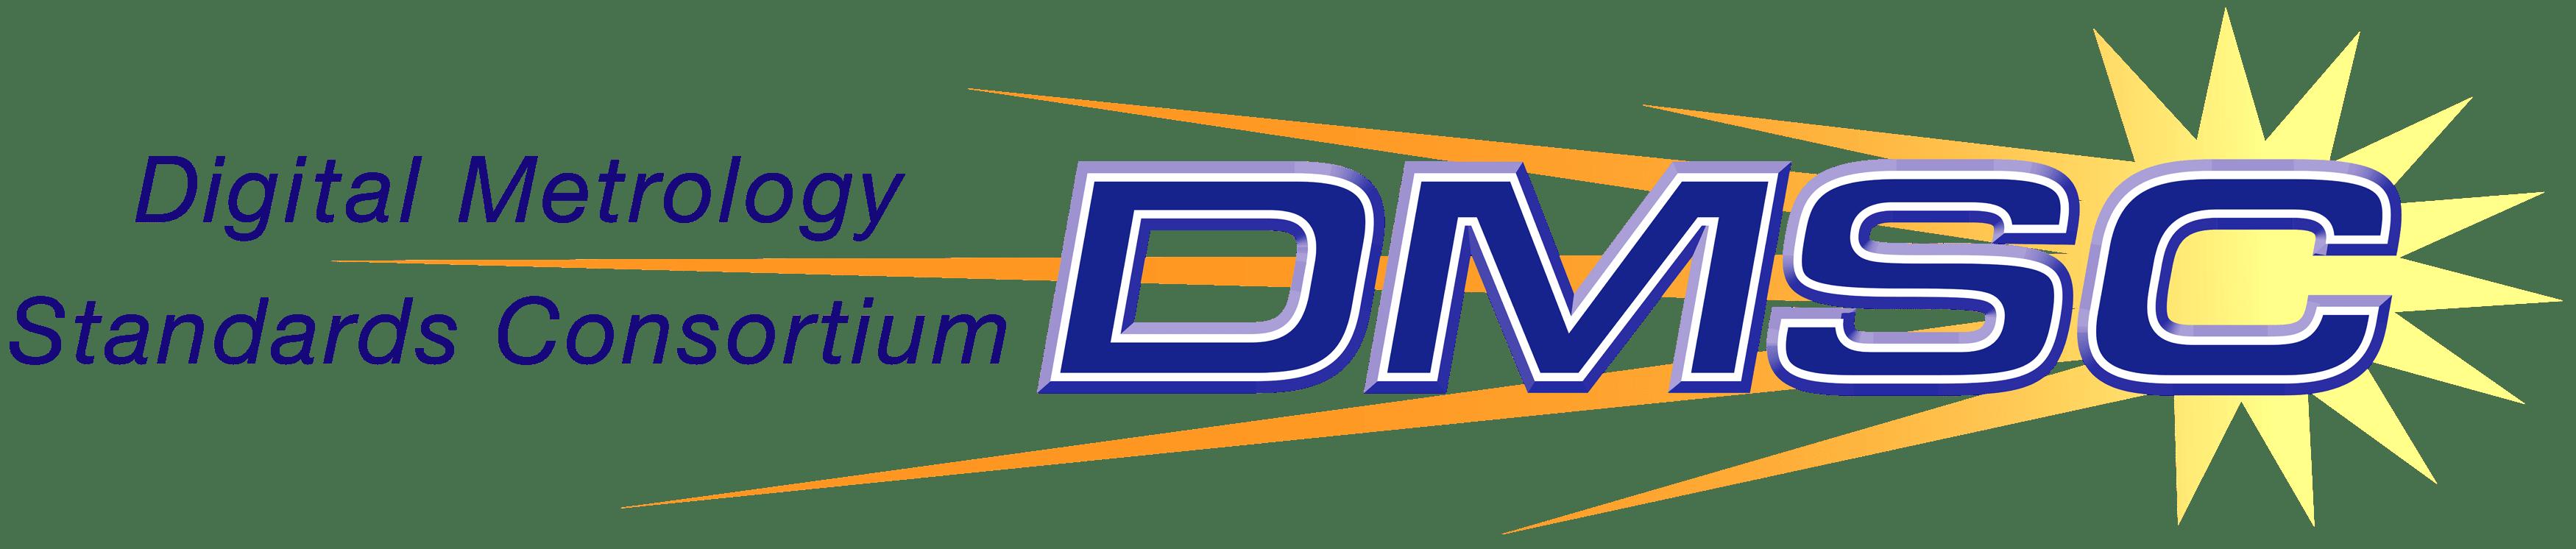 DMSC Digital Metrology Standards Consortium